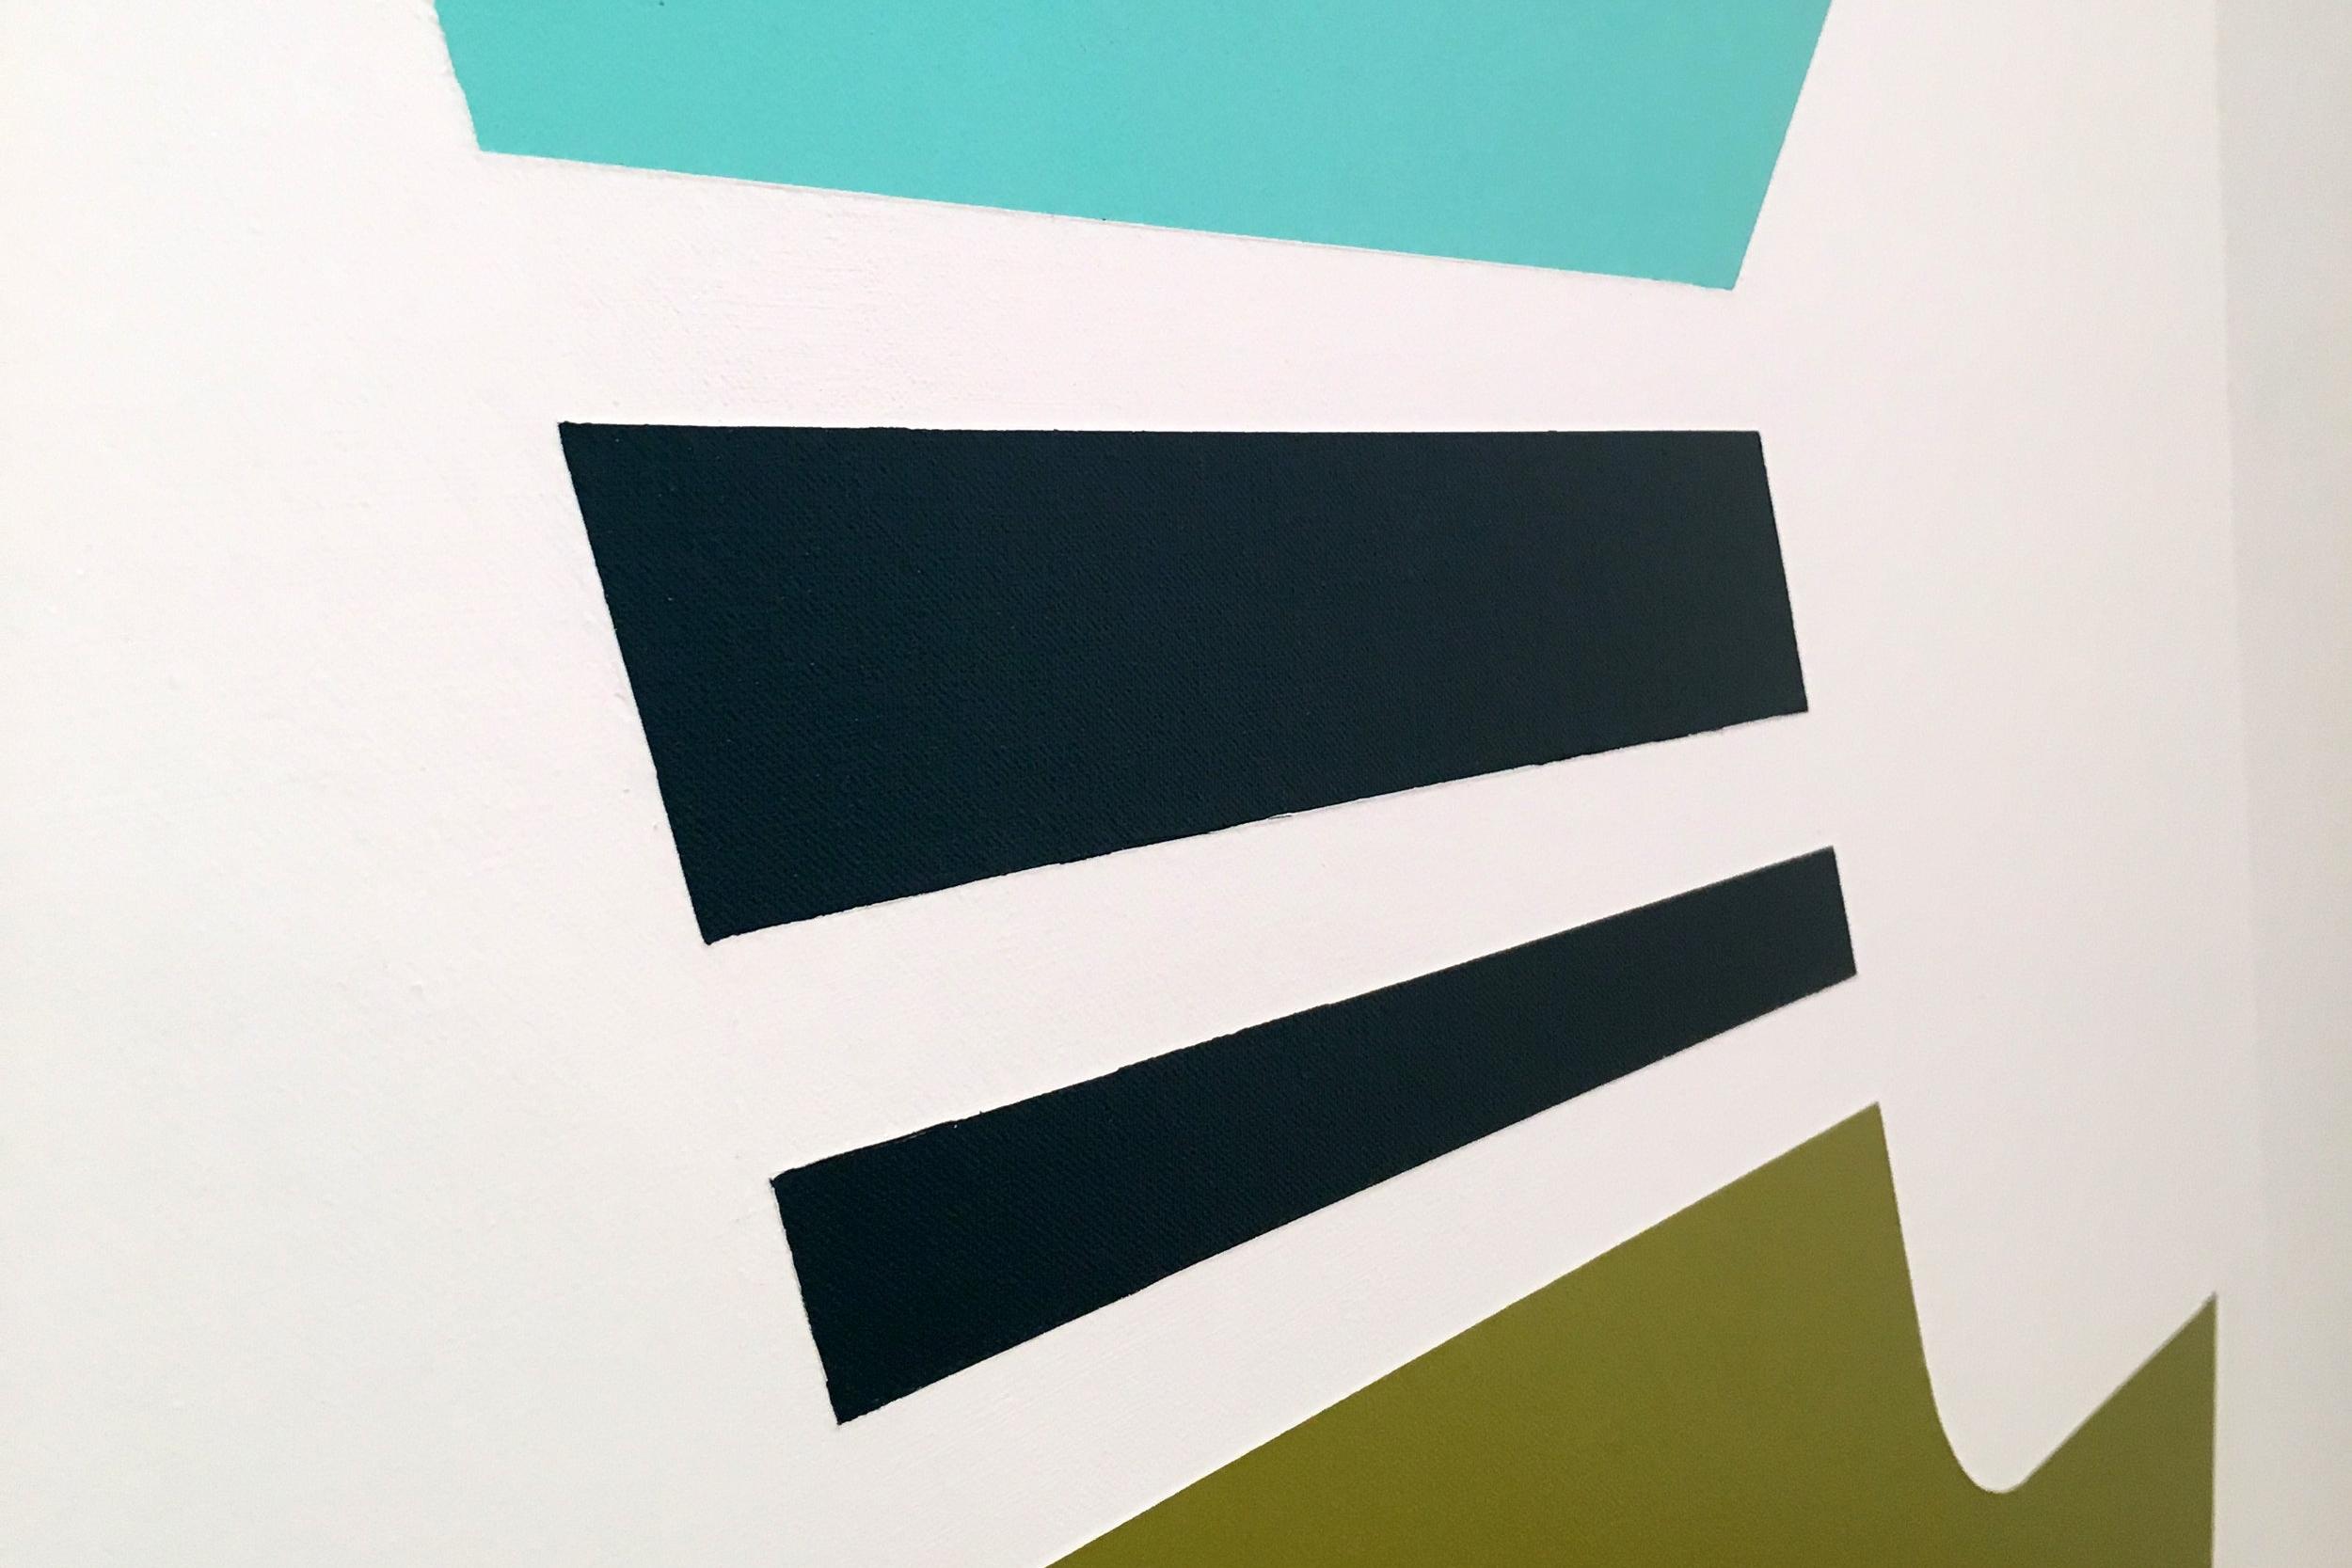 SIMPLEXITY - ARTSY 6.29.18 - 8.13.18